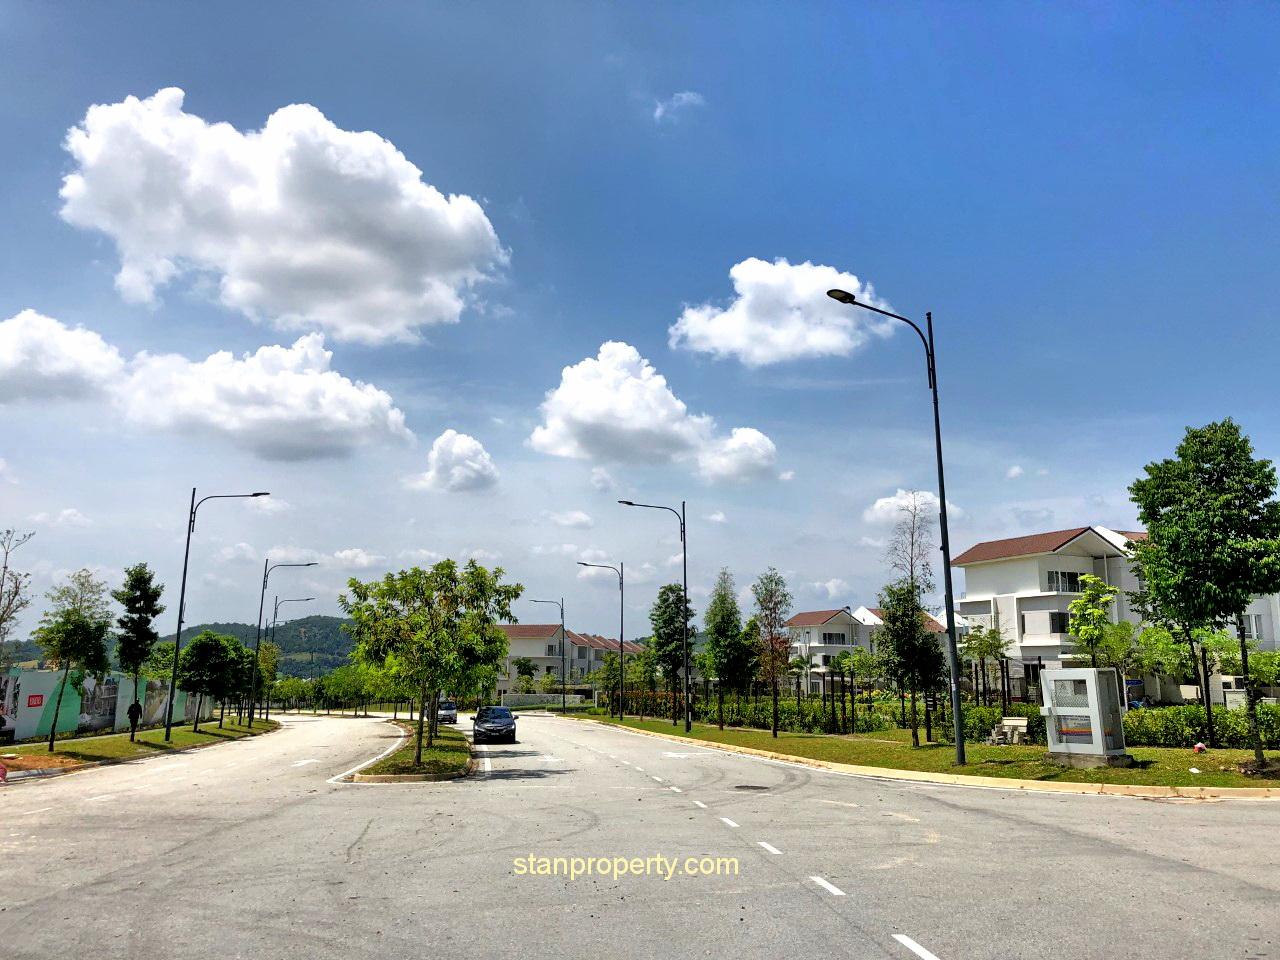 Superlink Rawang